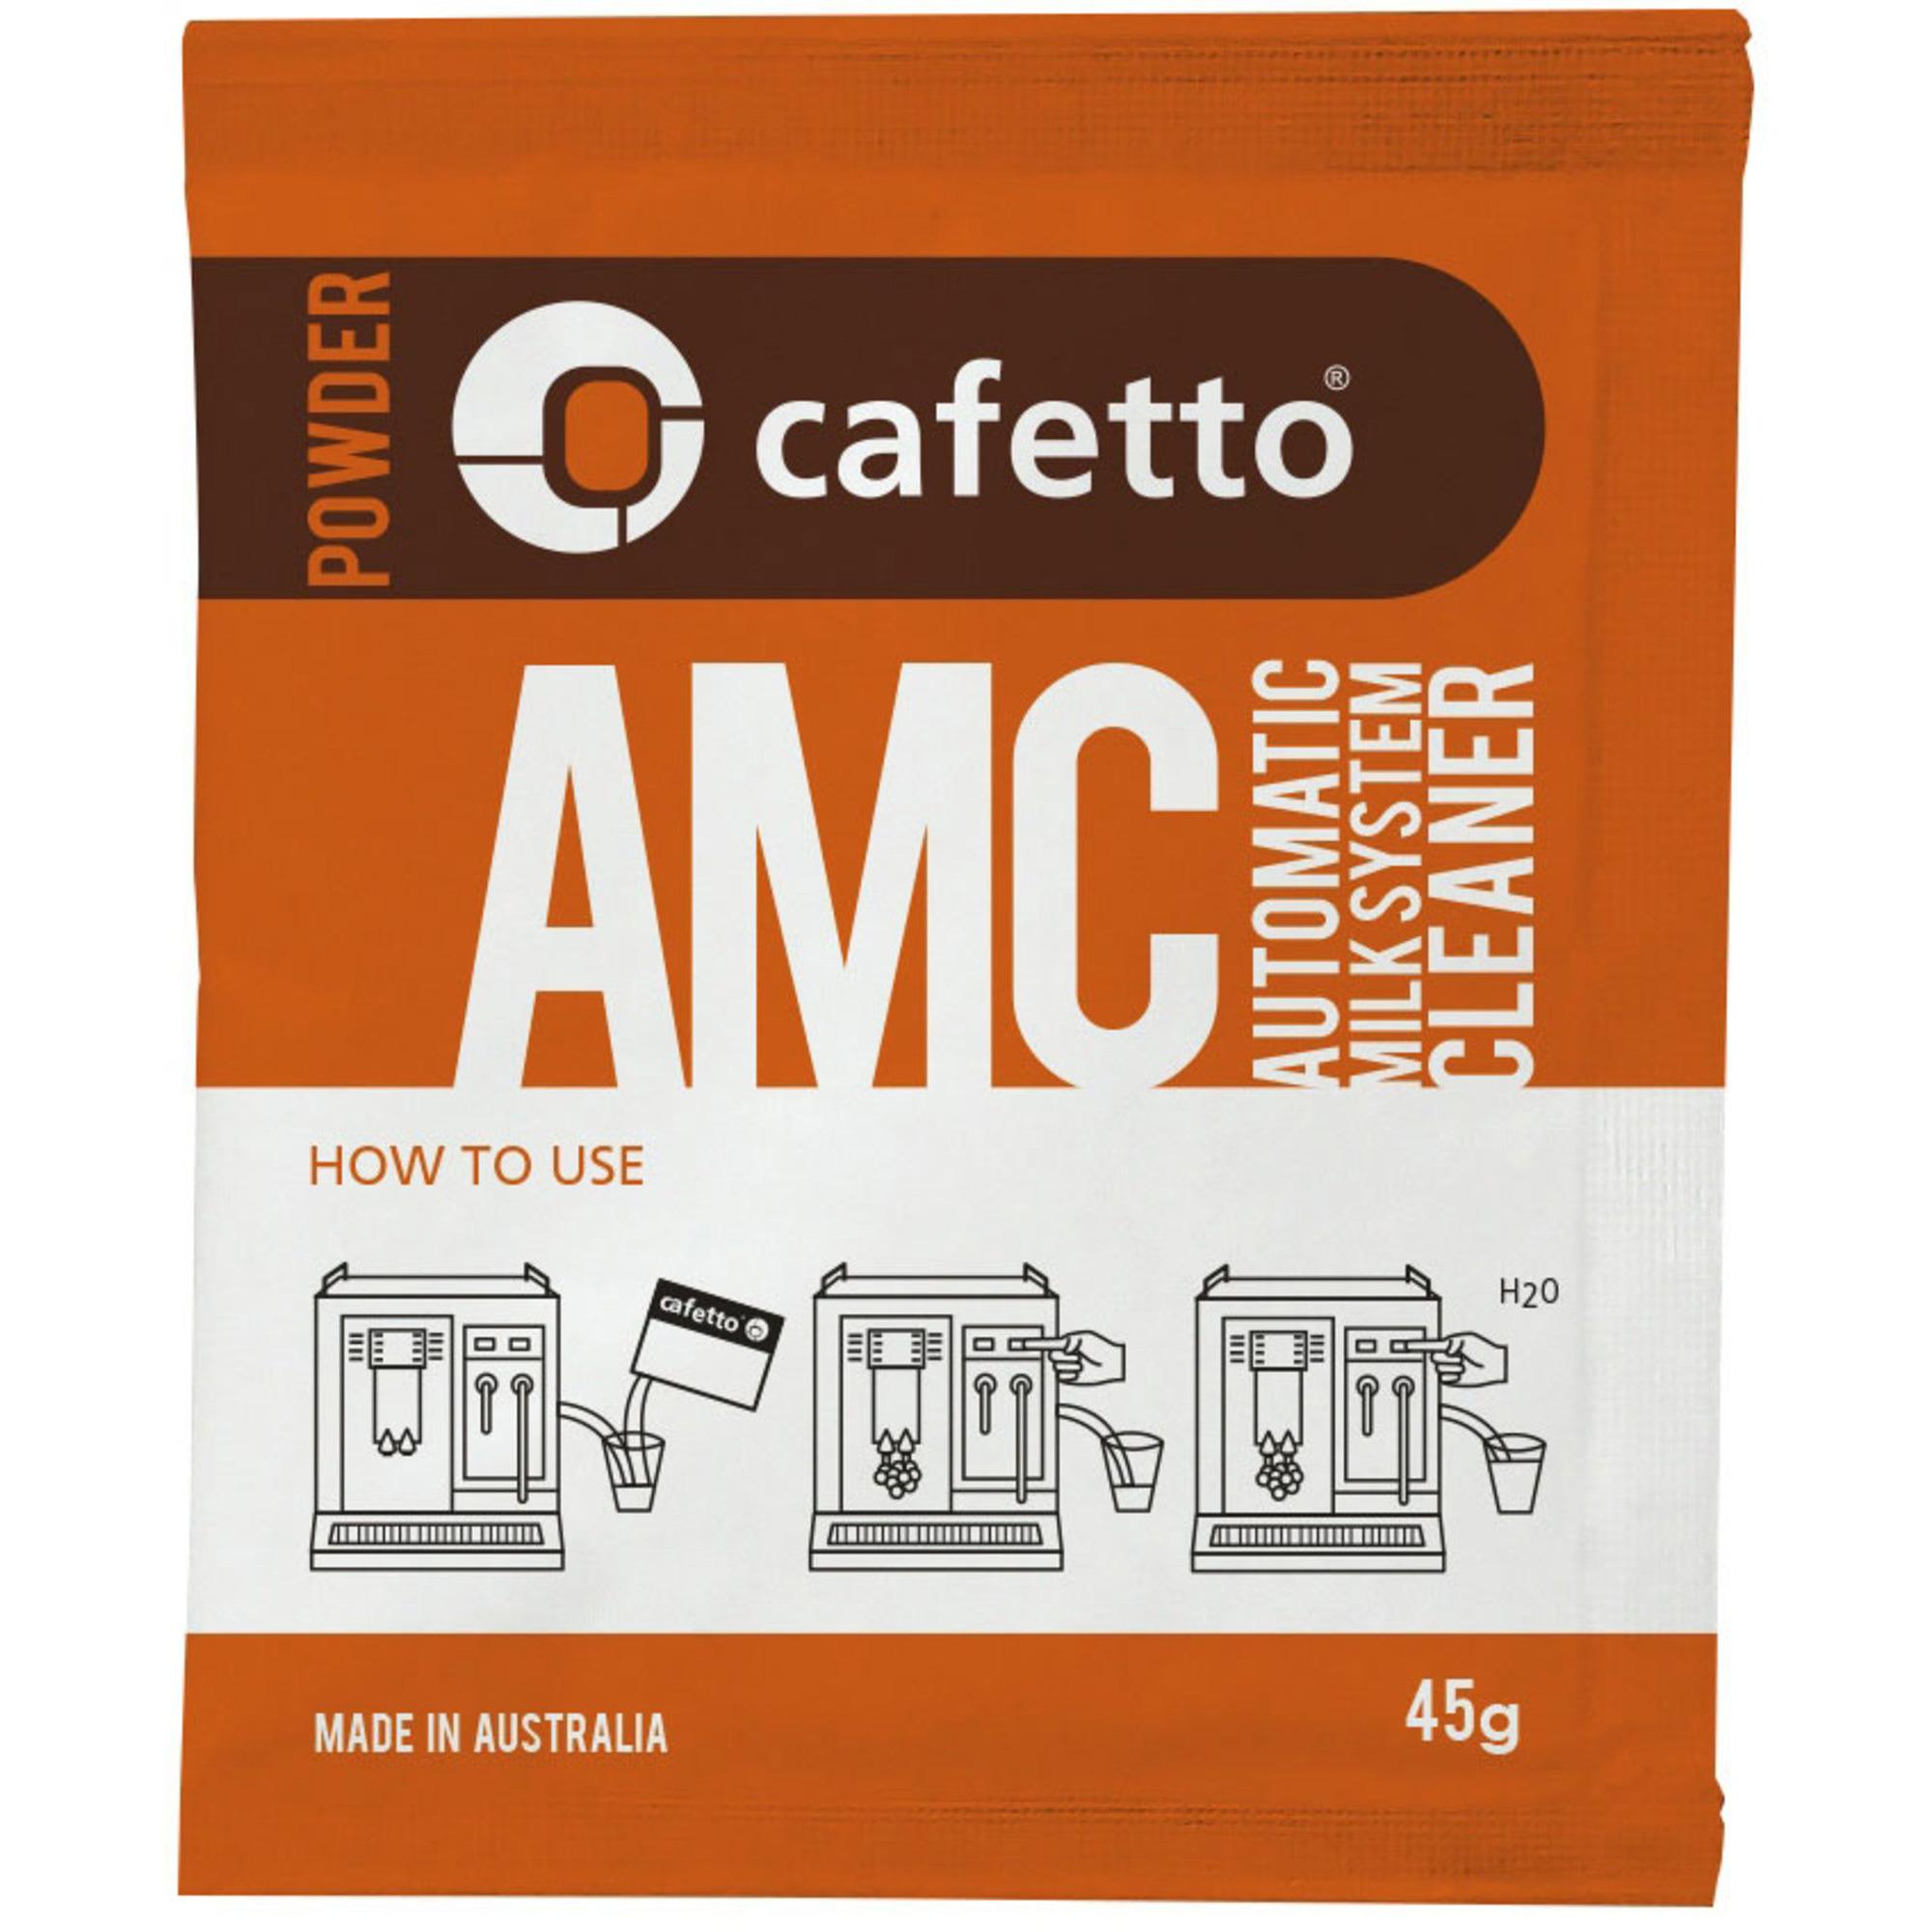 Cafetto AMC Rengöringspulver